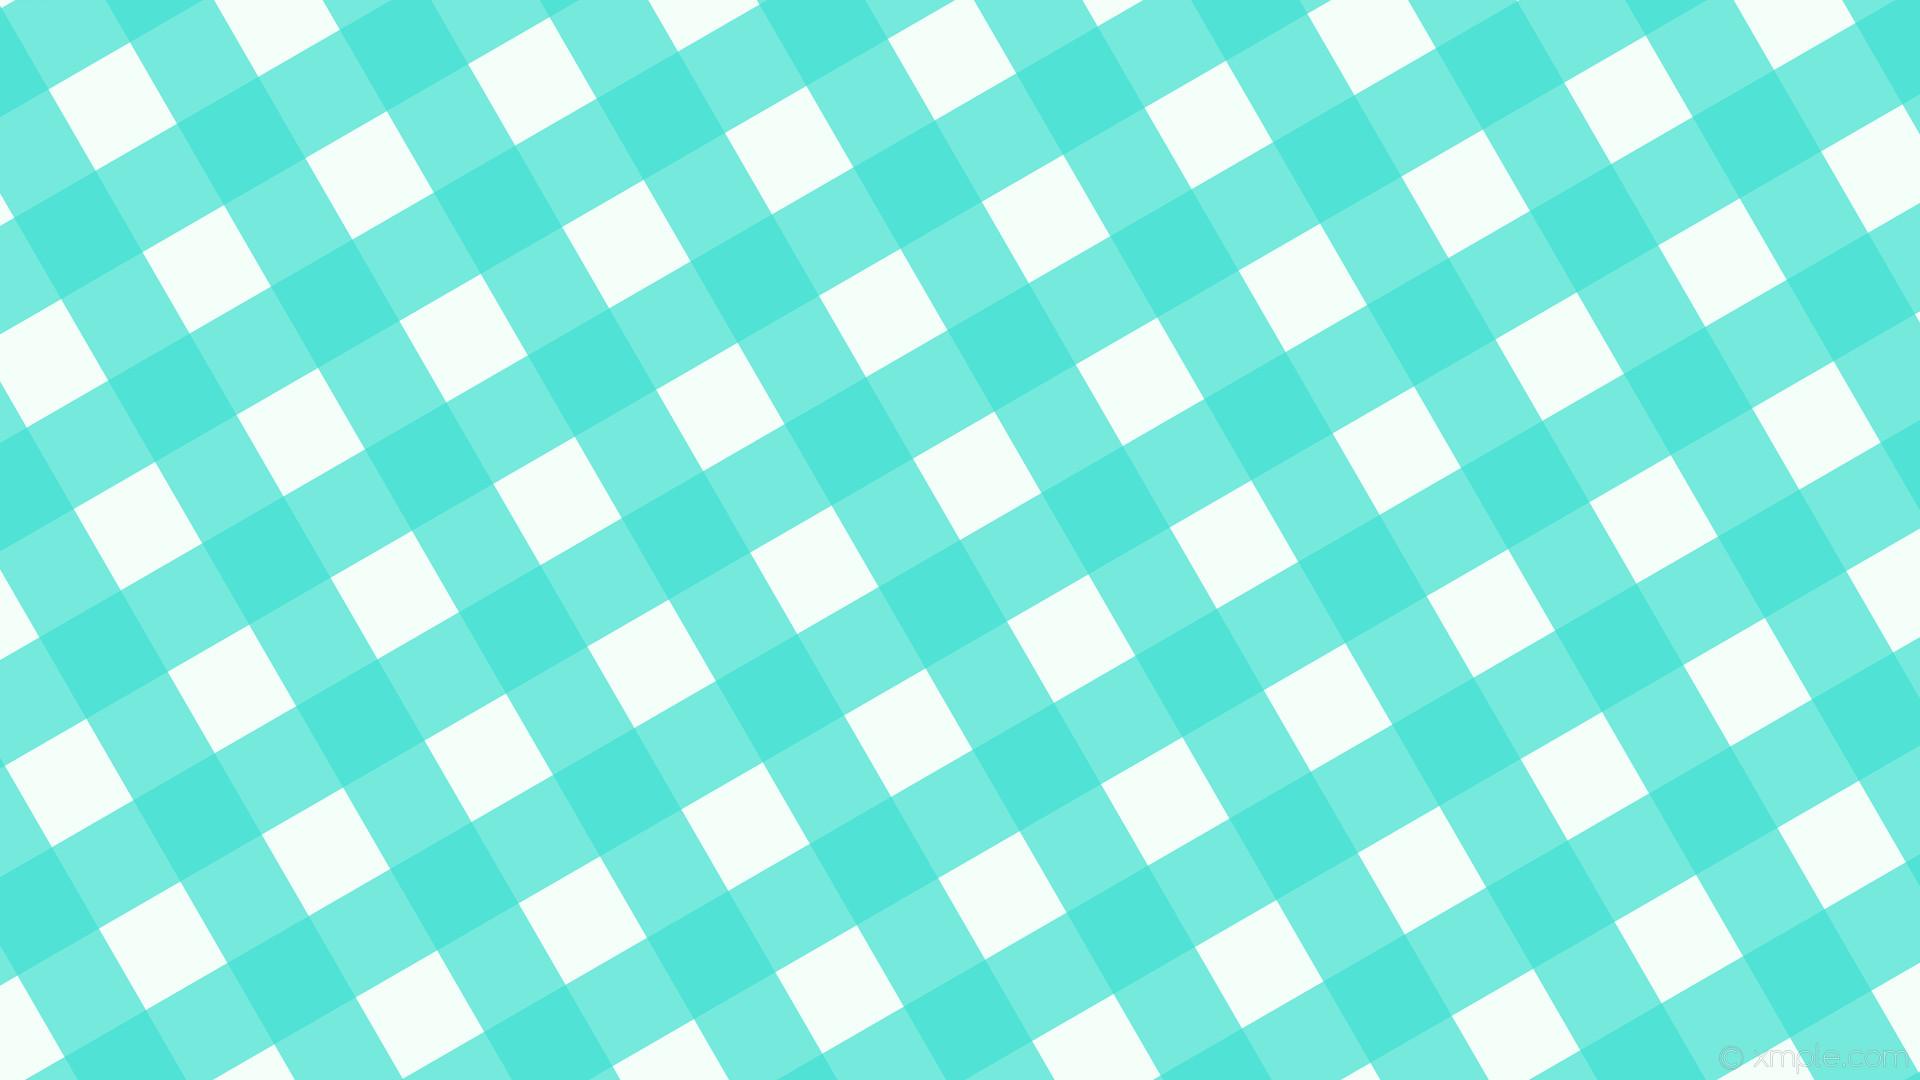 wallpaper checker gingham striped white blue mint cream turquoise #f5fffa  #40e0d0 300° 94px